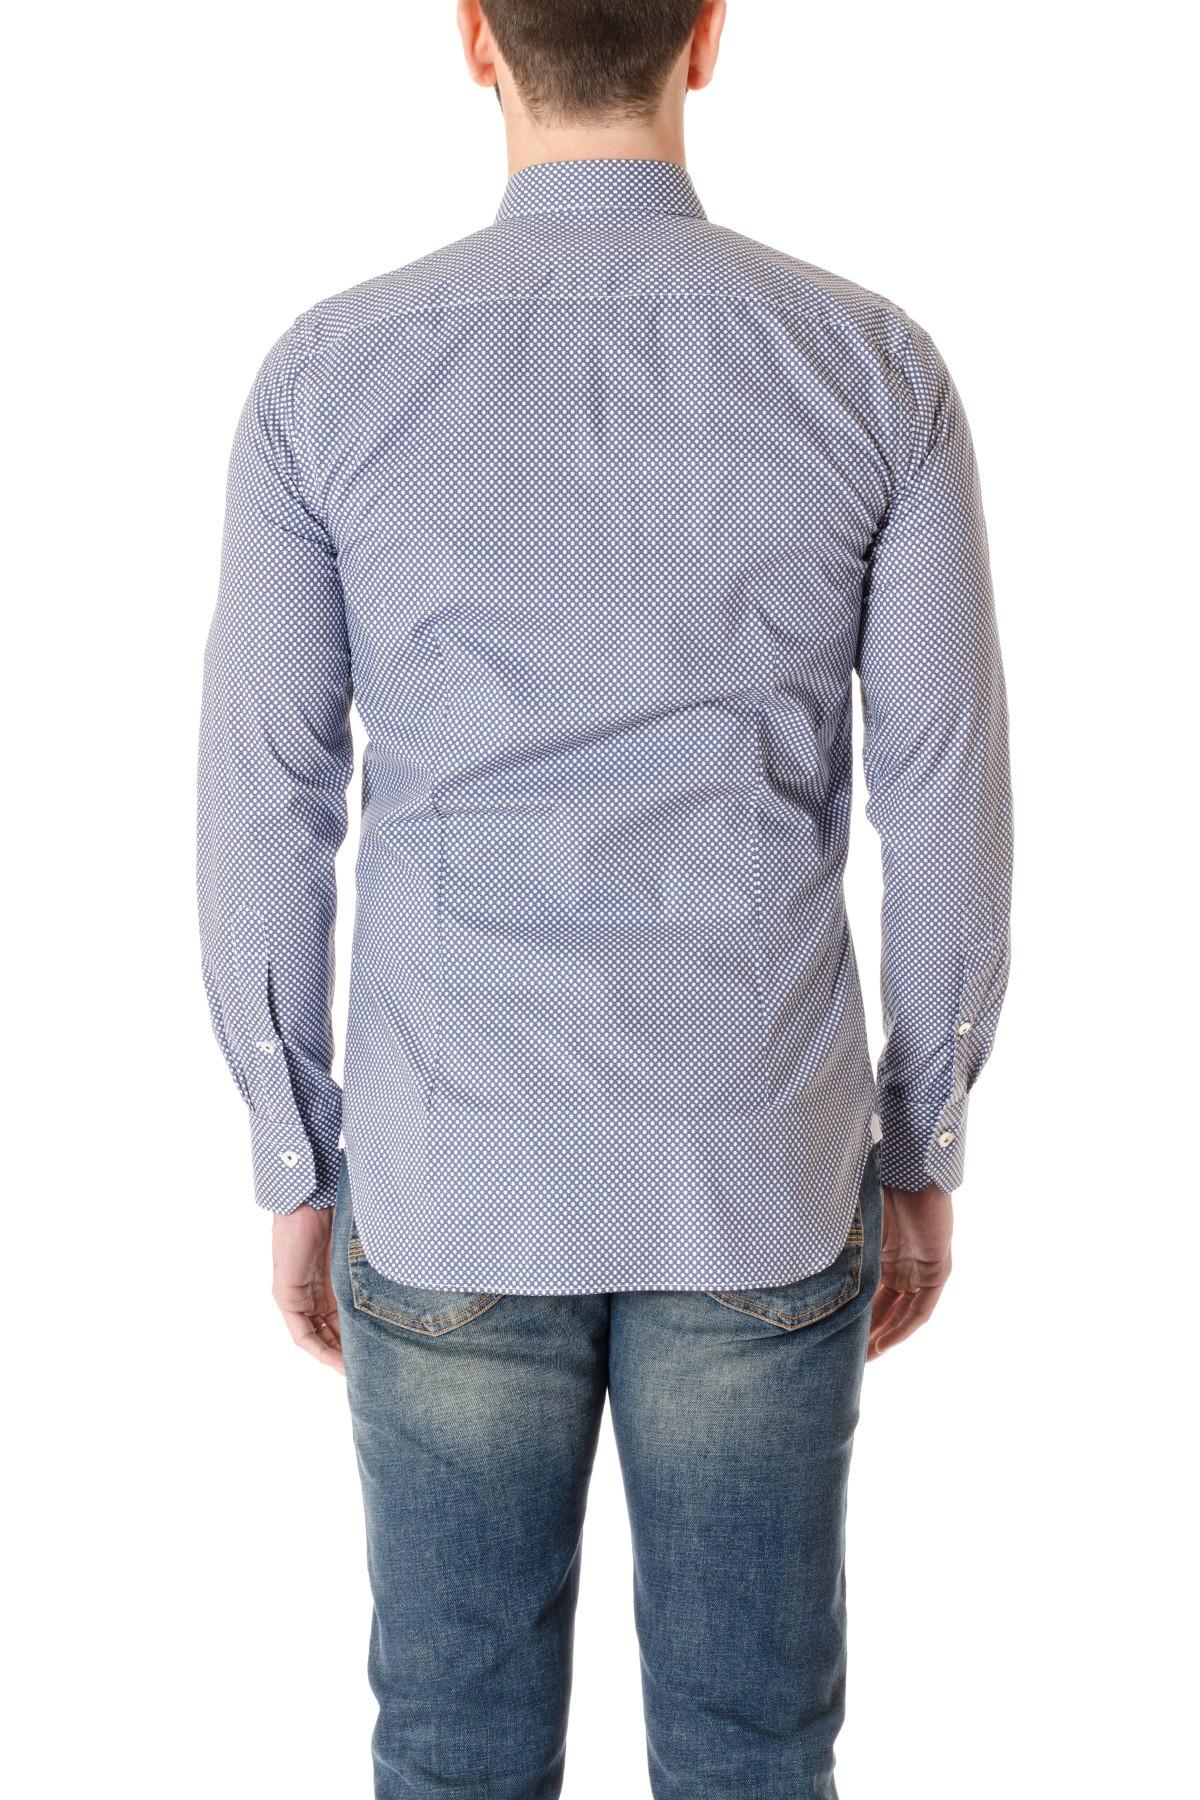 11e5f56fe9676d A/I Camicia BORSA blu a pois bianchi SLIM2 - Rione Fontana